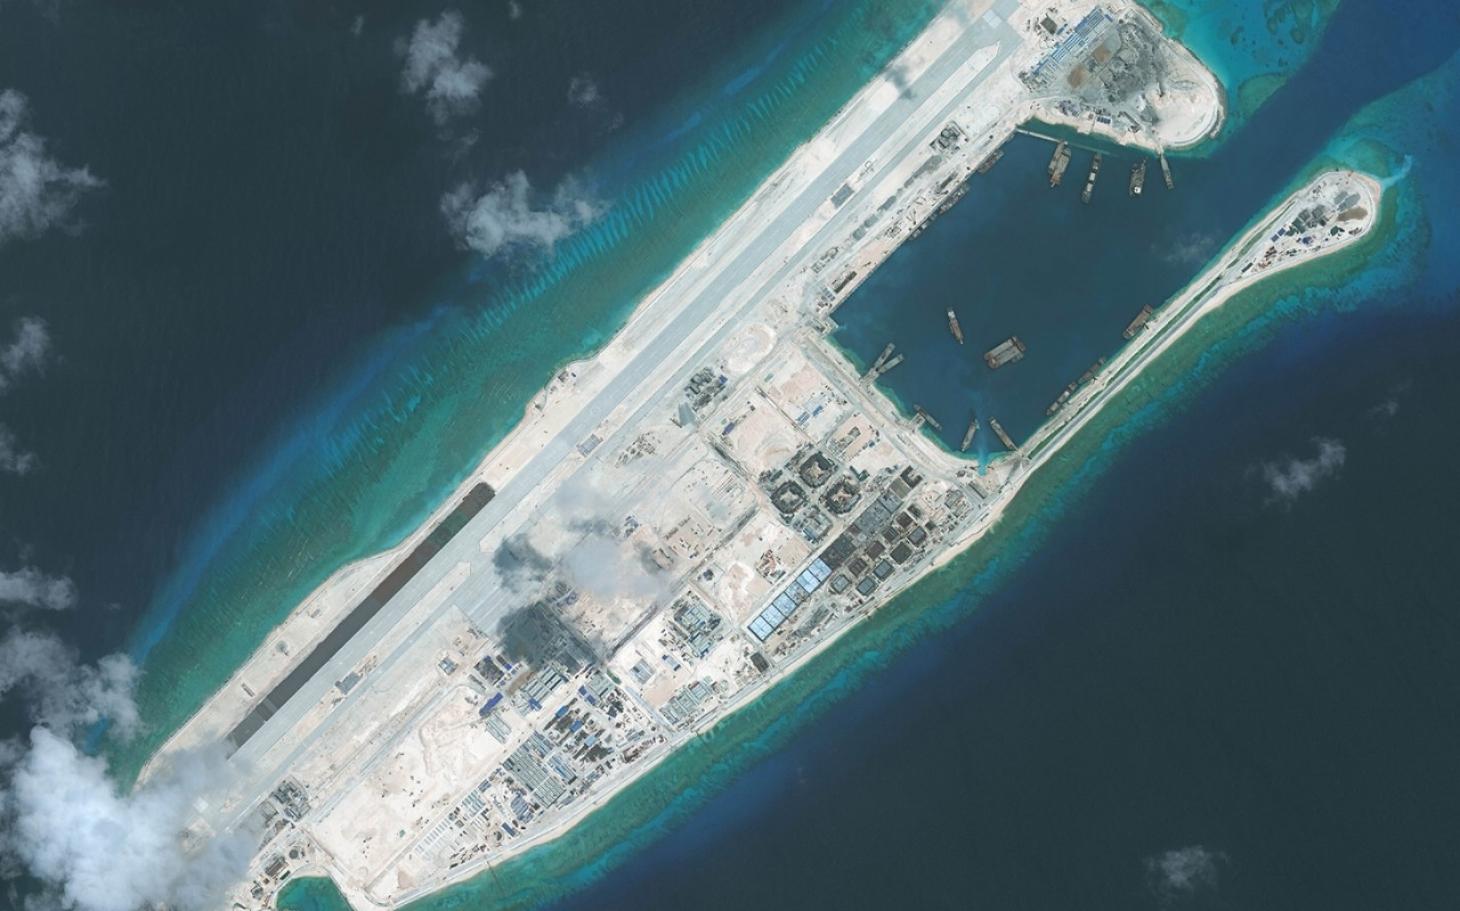 US Mulls Sailing Near Disputed Islands   Al Jazeera America